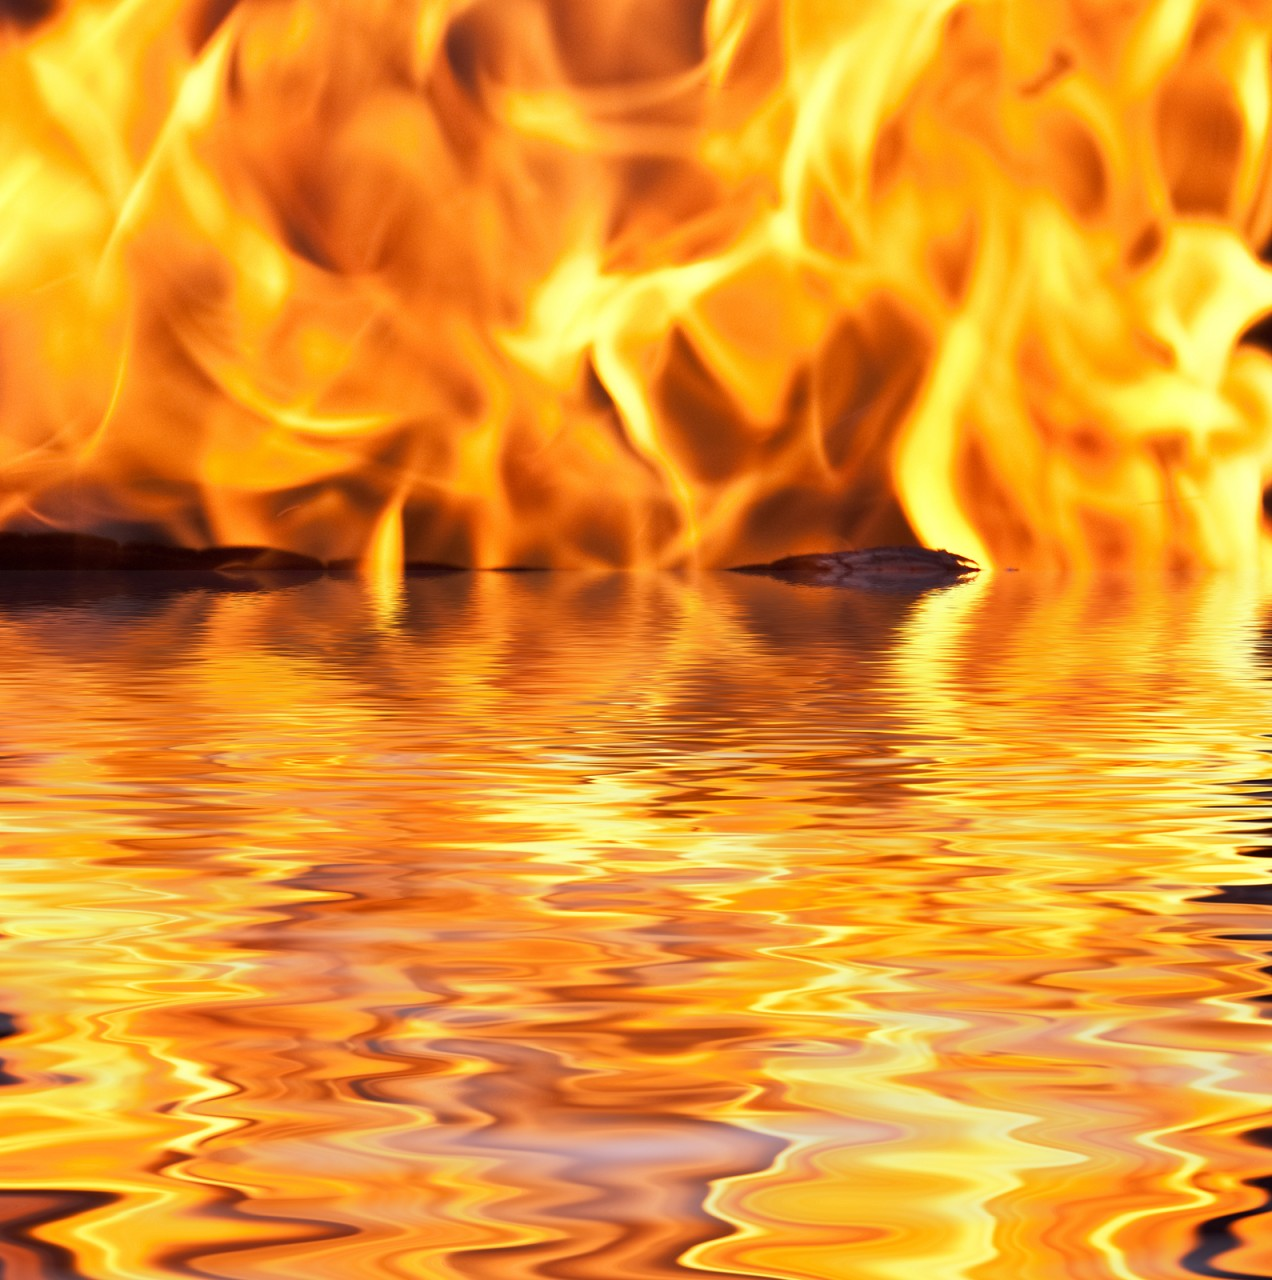 BLOG: Baptism of fire?